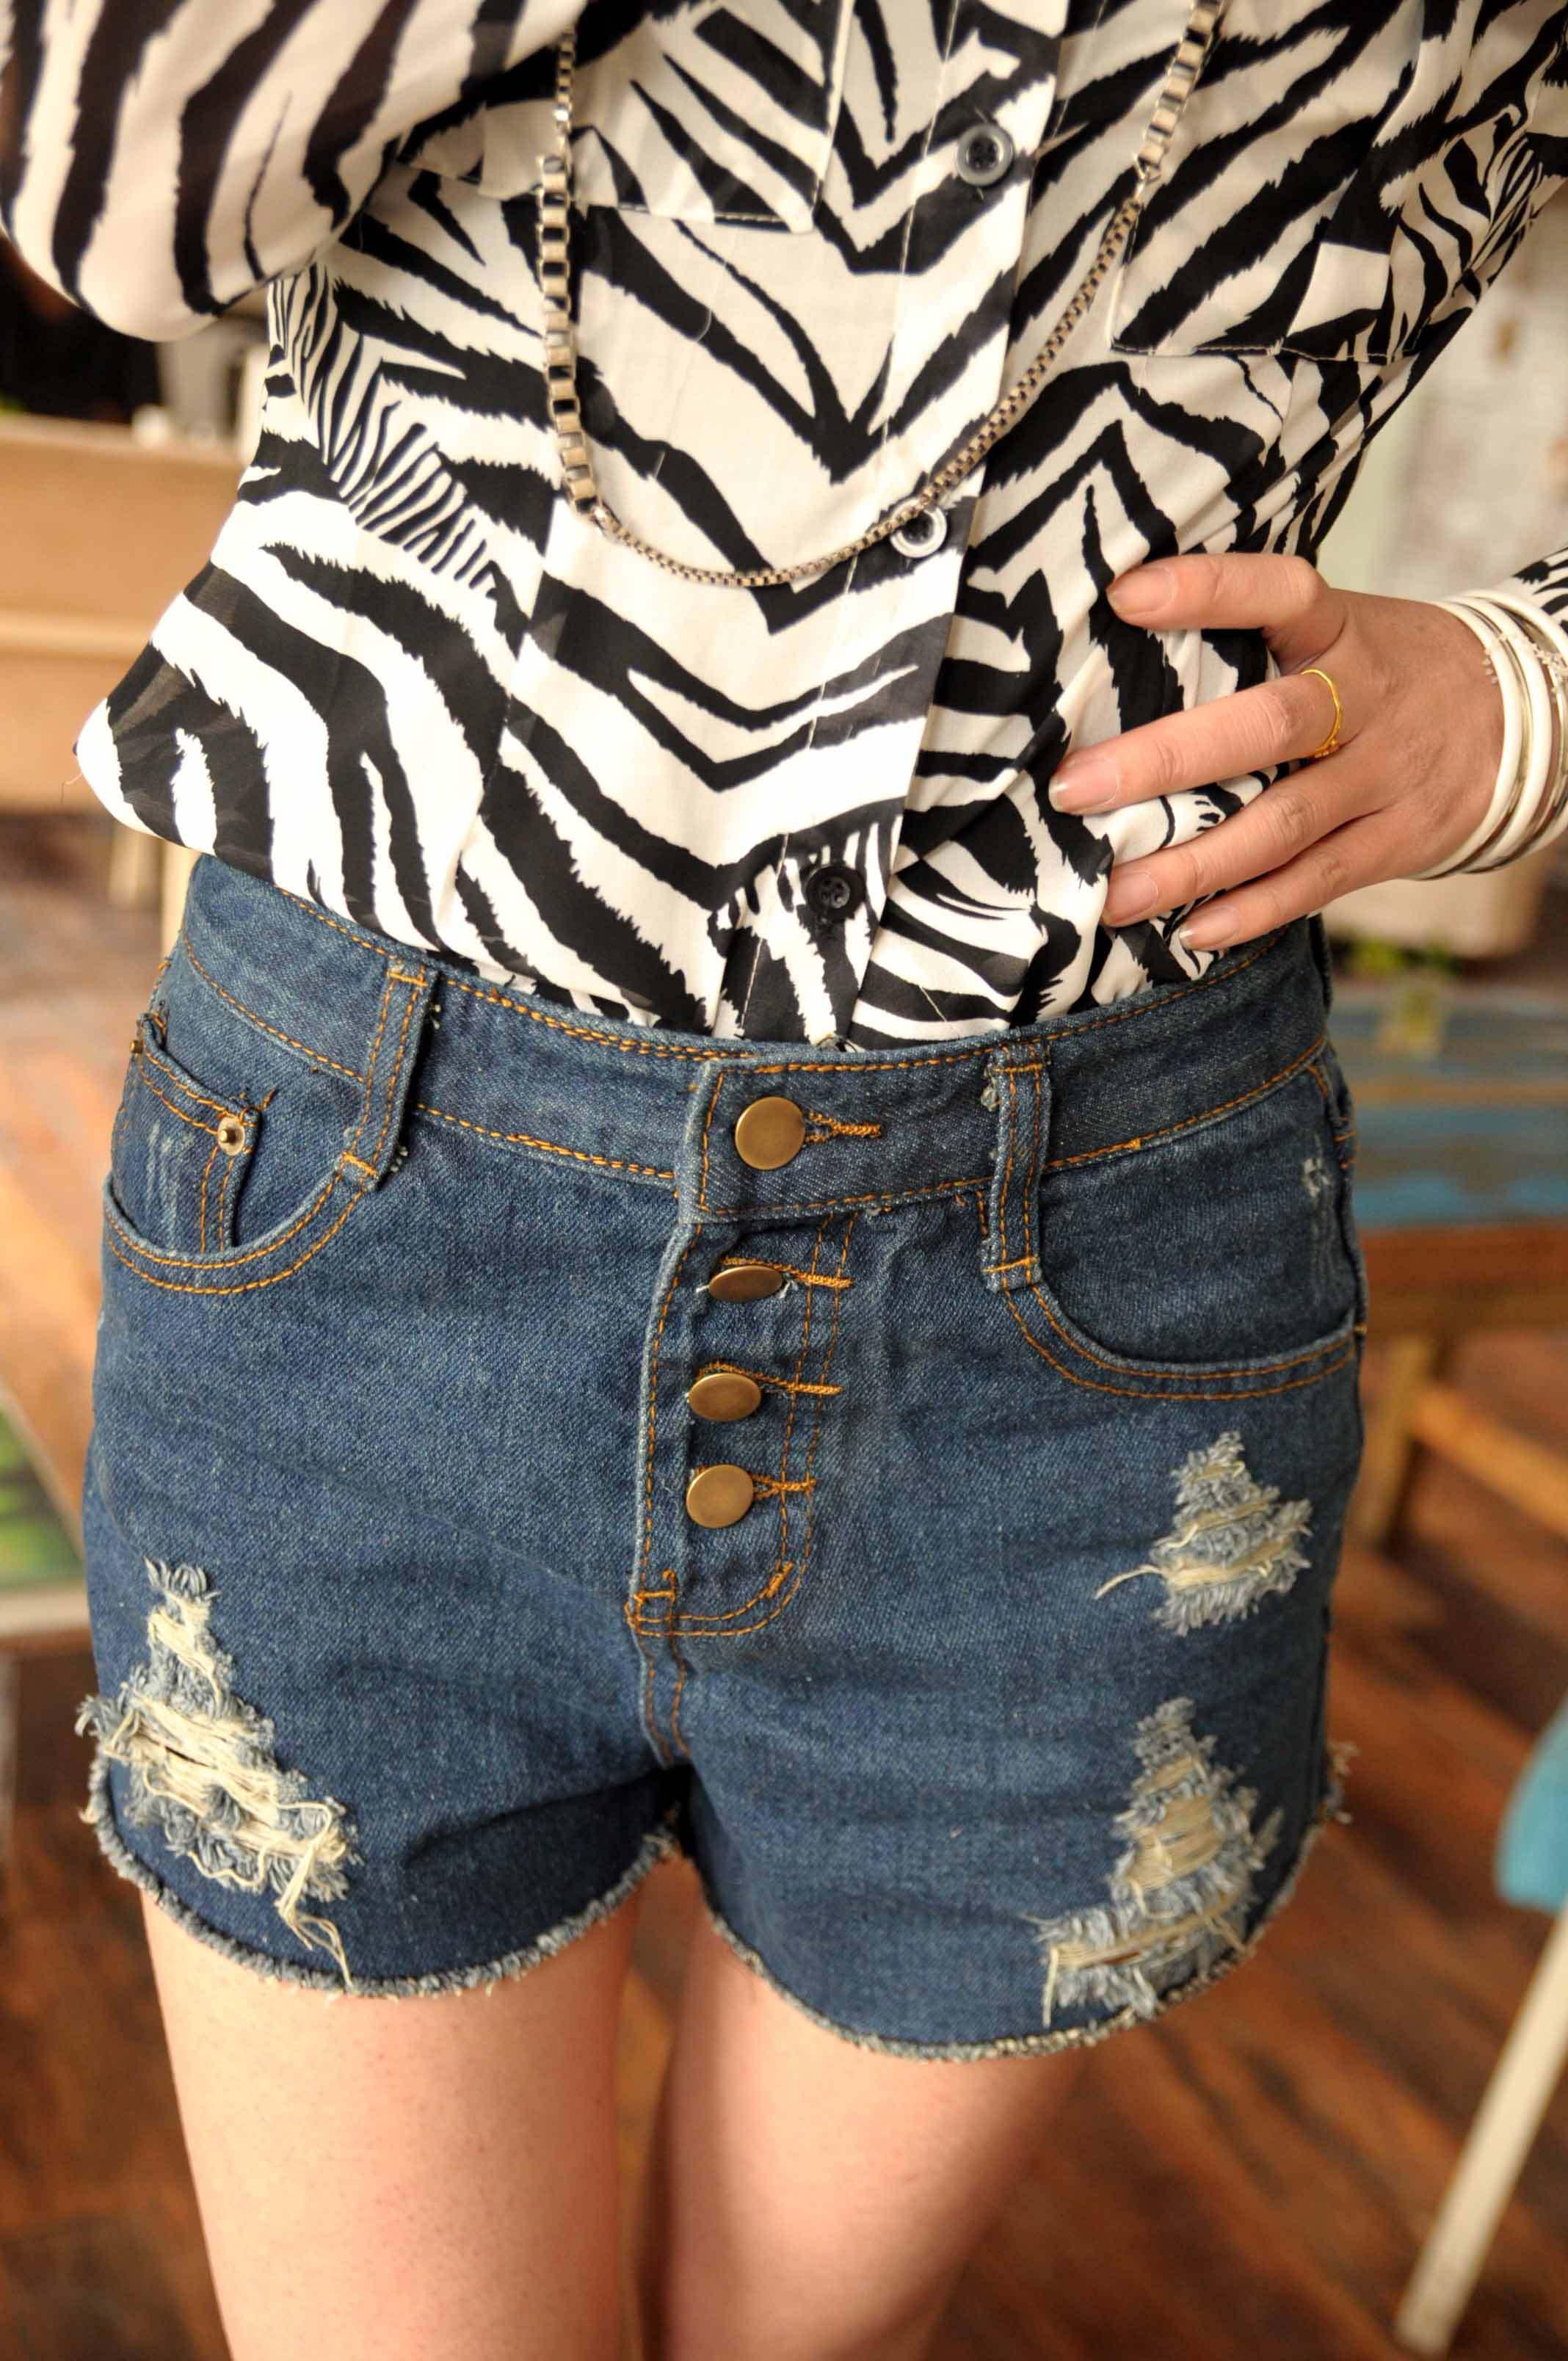 Женские брюки 806a581 p45 2011 Шорты, мини-шорты Другая форма брюк